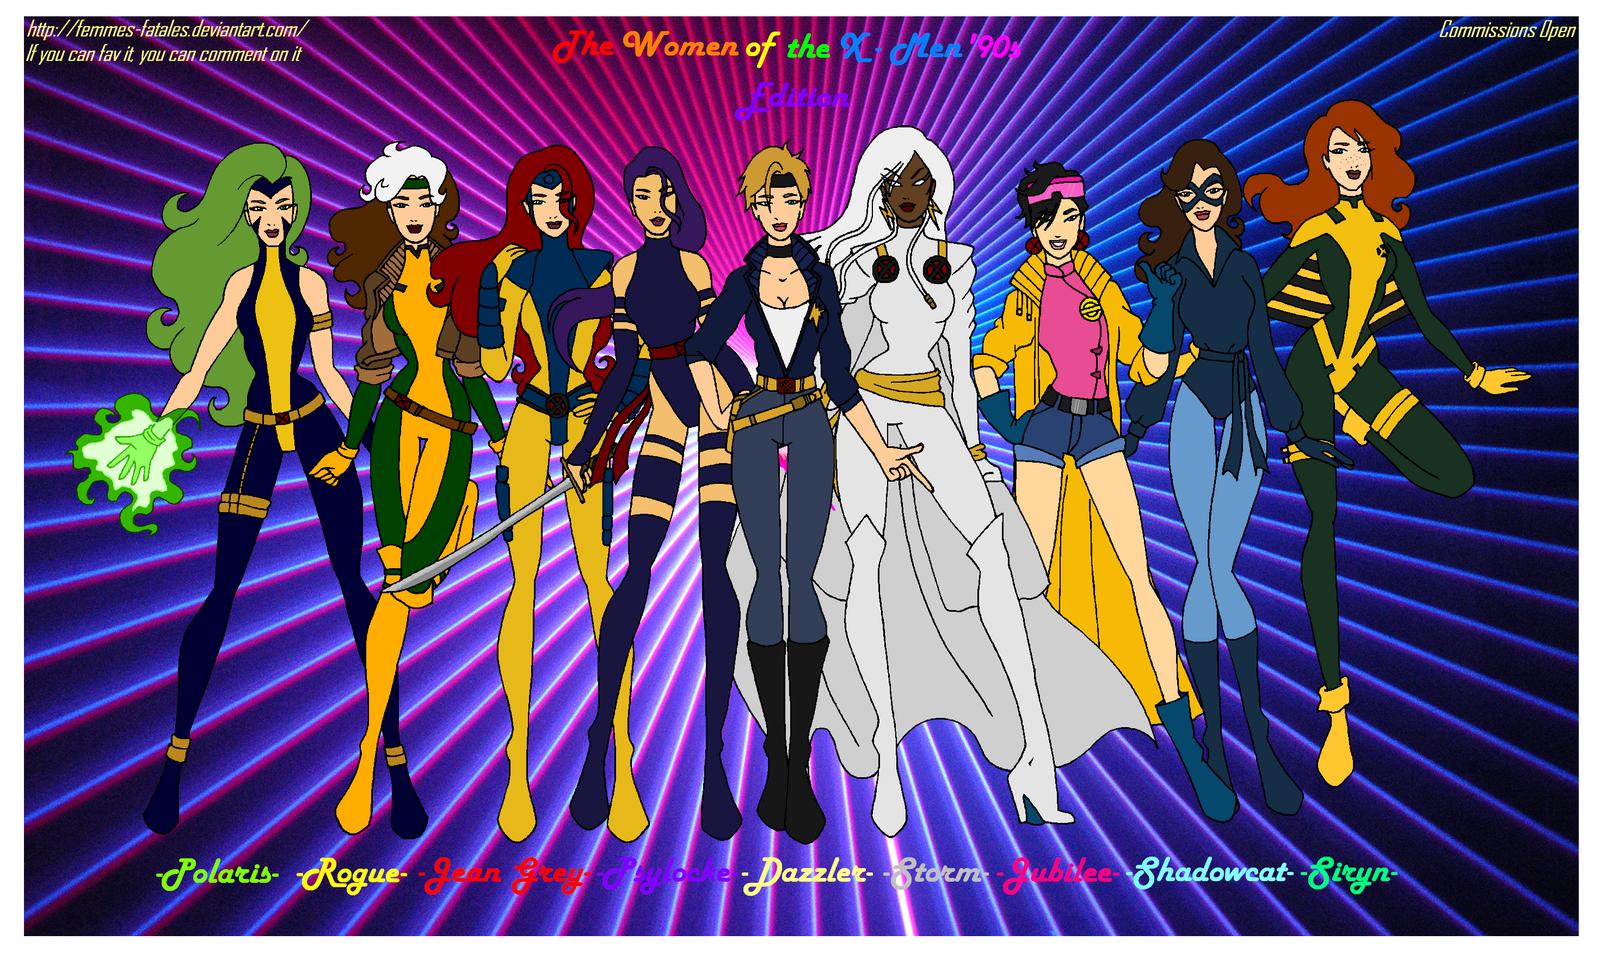 X Men Girl The Women of the X-Men...